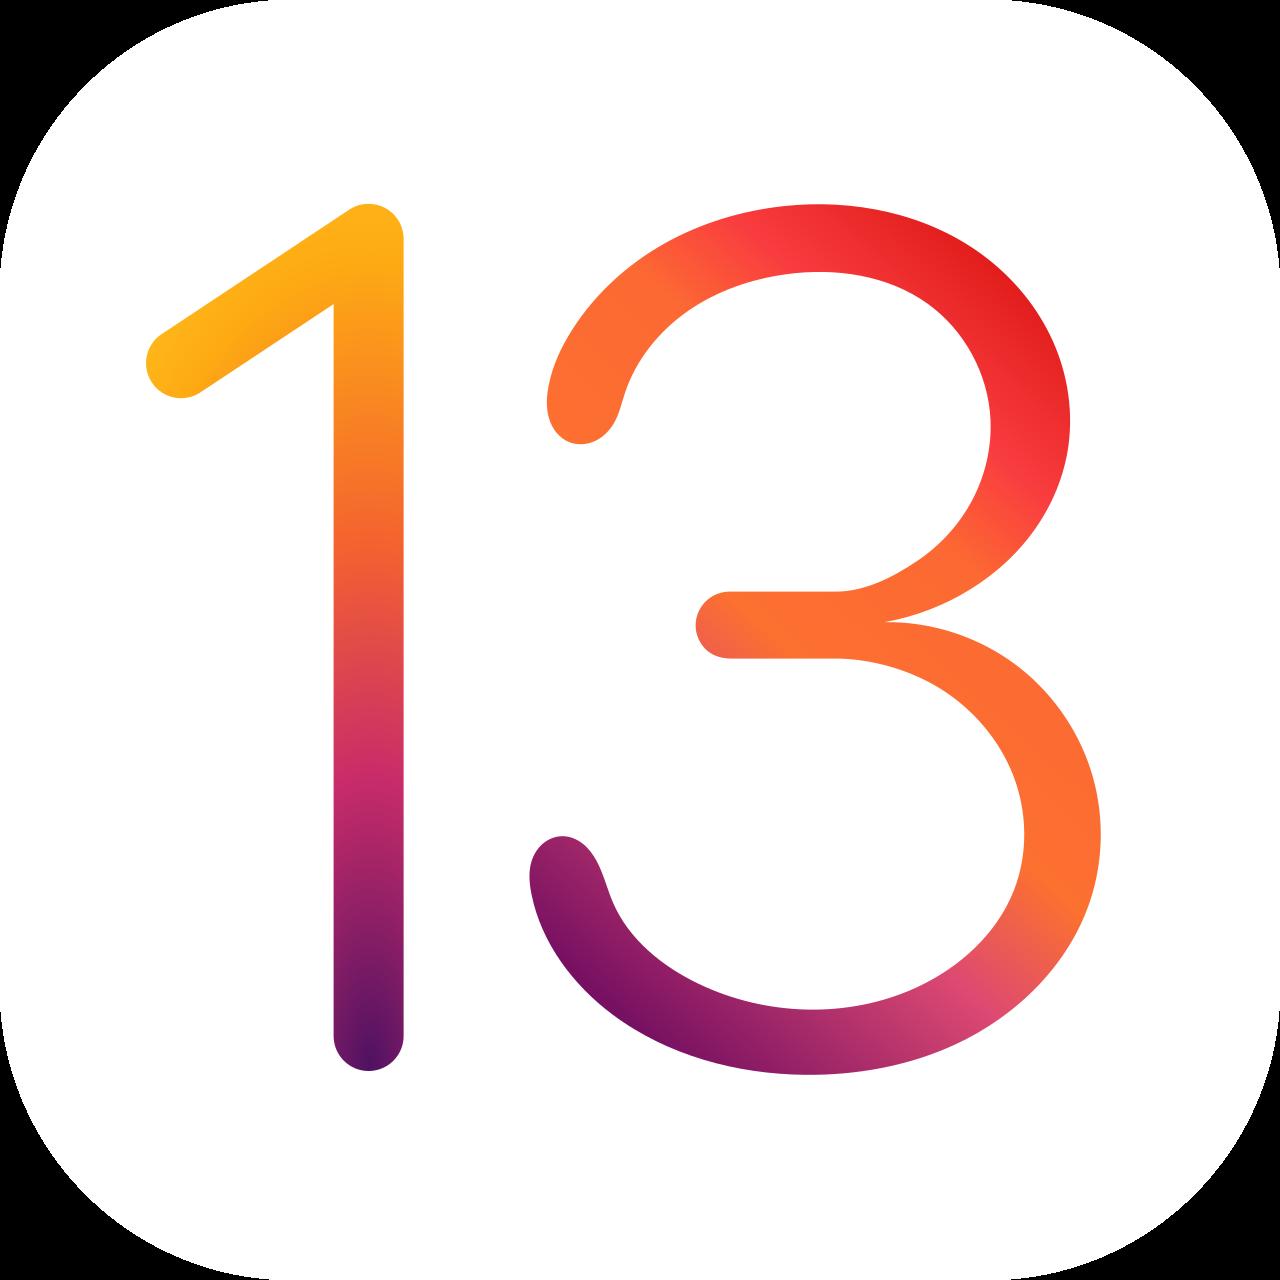 iOS 13 logo